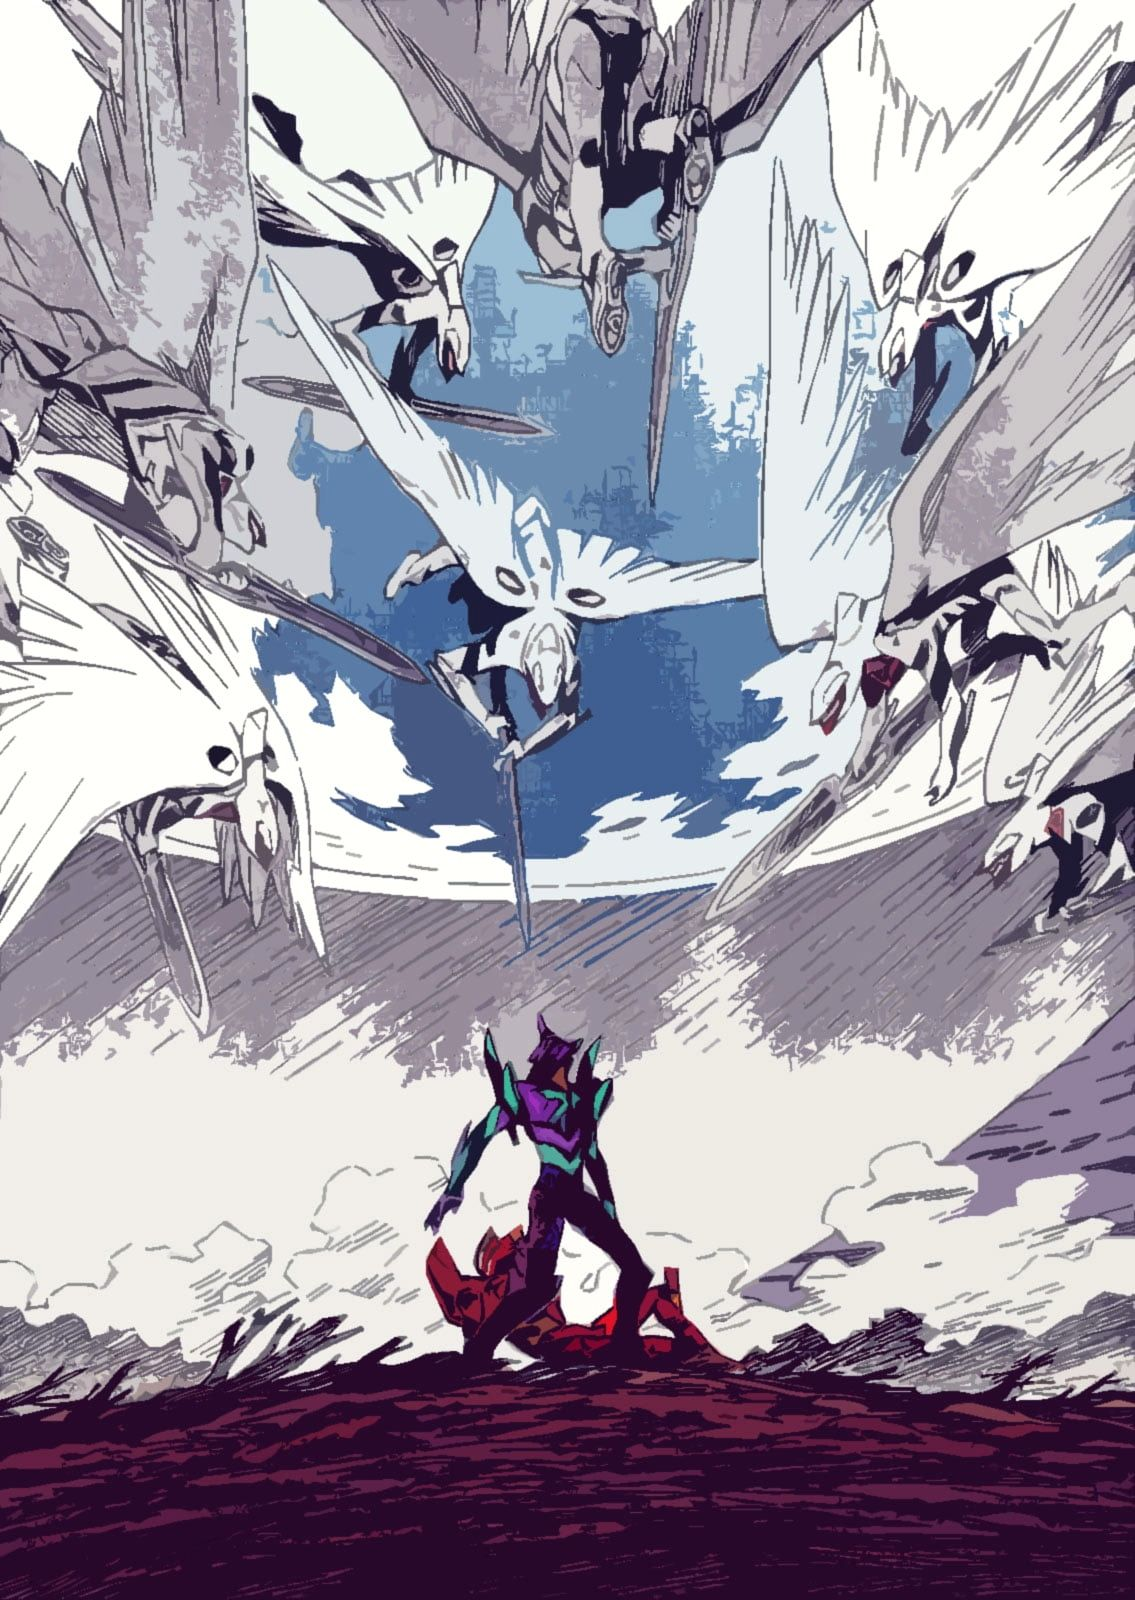 Evangelion Wallpaper 4k Iphone Trick Em 2020 Animes Wallpapers Anime Personagens De Anime